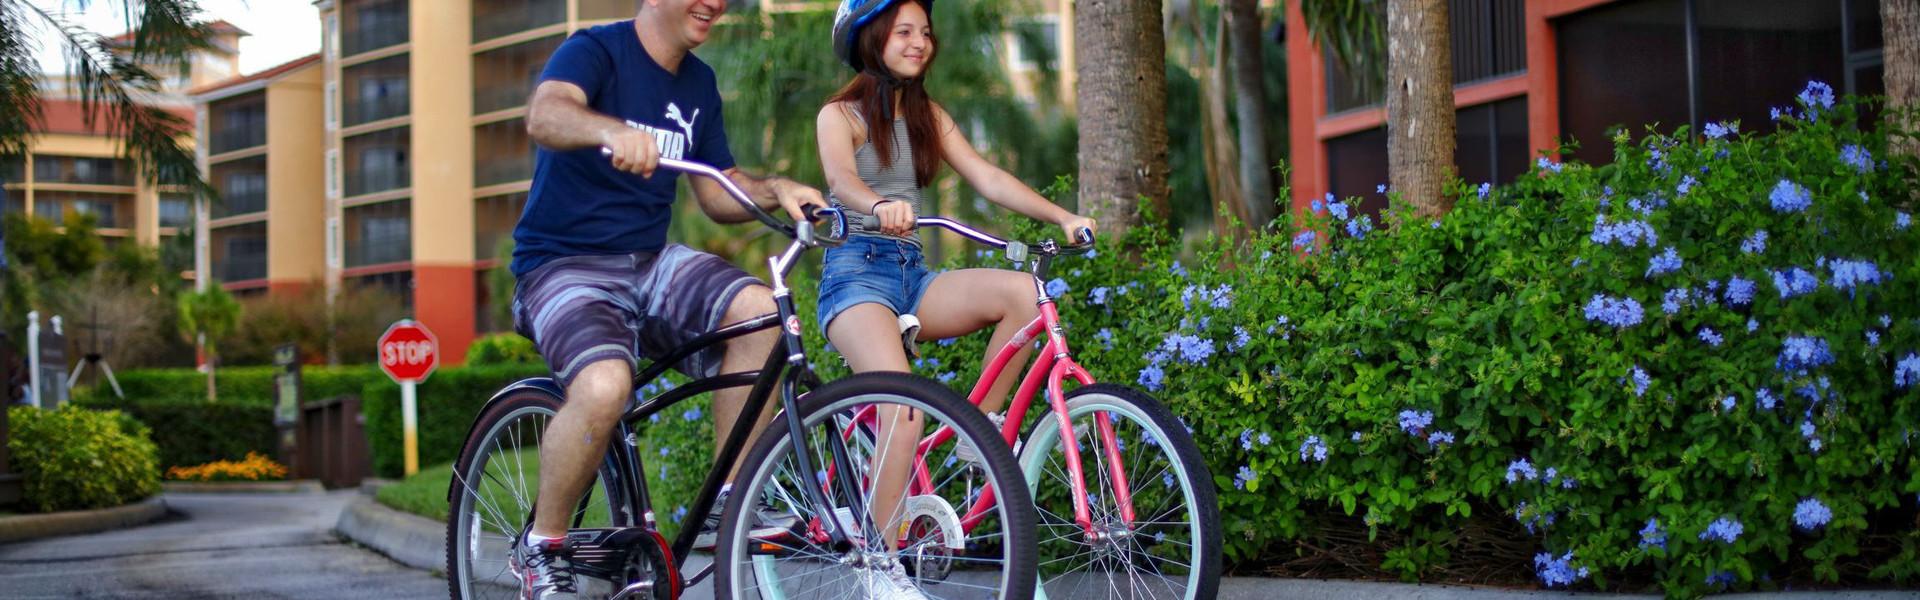 Hotel Bicycle Rental | Rent a Bike at Our Orlando Resort | Westgate Lakes Resort & Spa